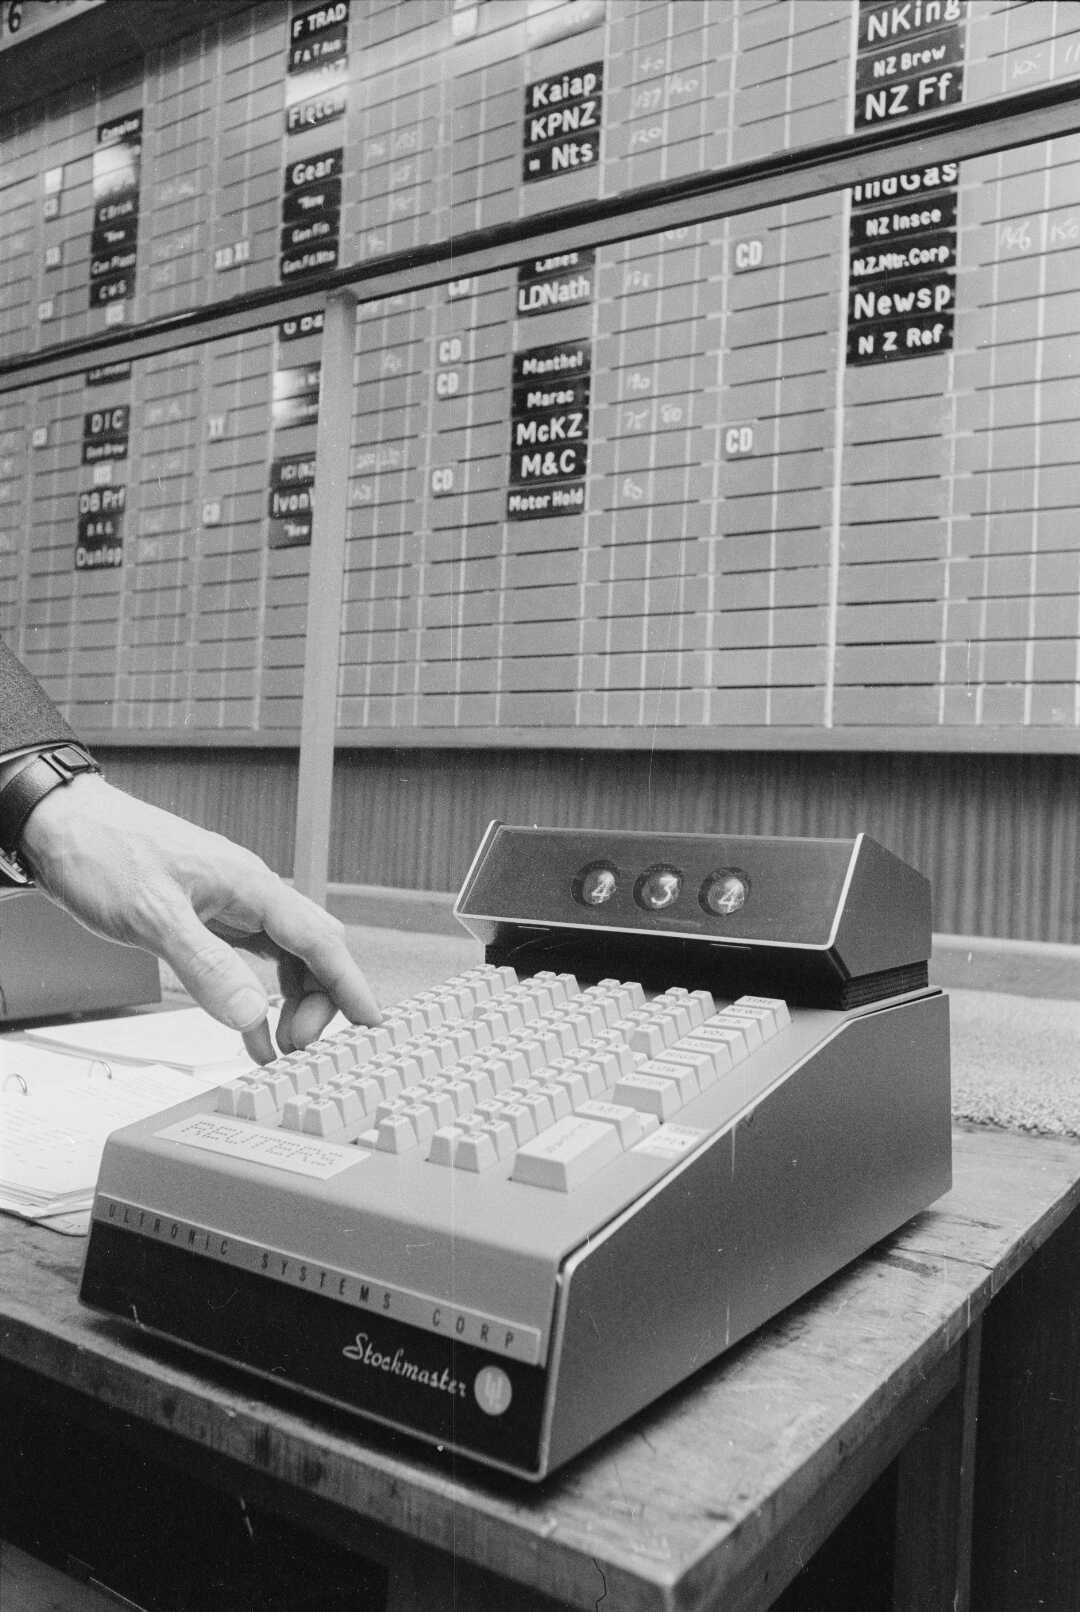 Wellington Stock Exchange 'Stockmaster' computer, 1970.